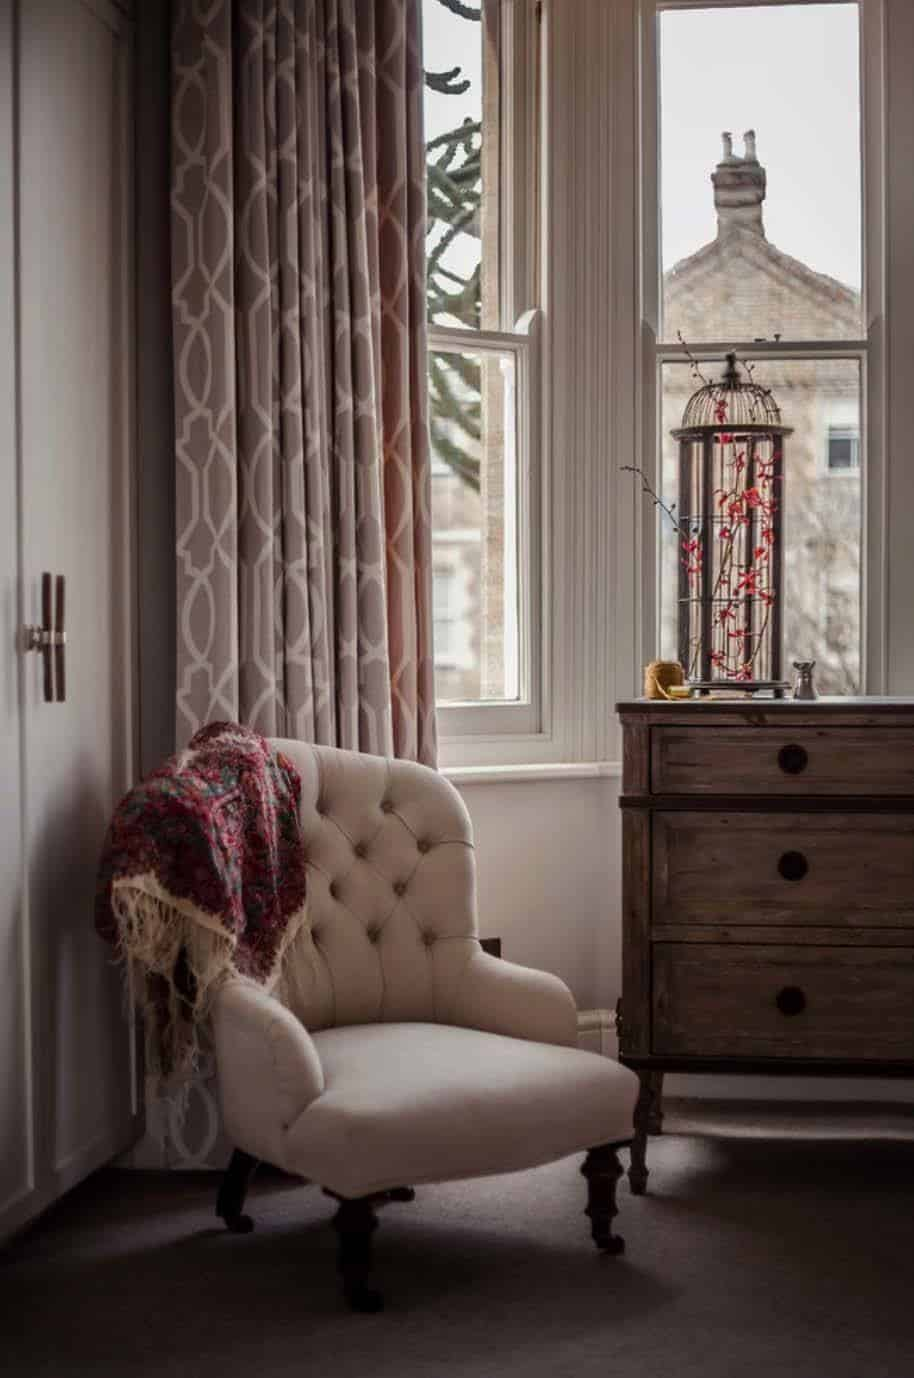 Oxford Family Home-Johnston Parke Interiors-14-1 Kindesign